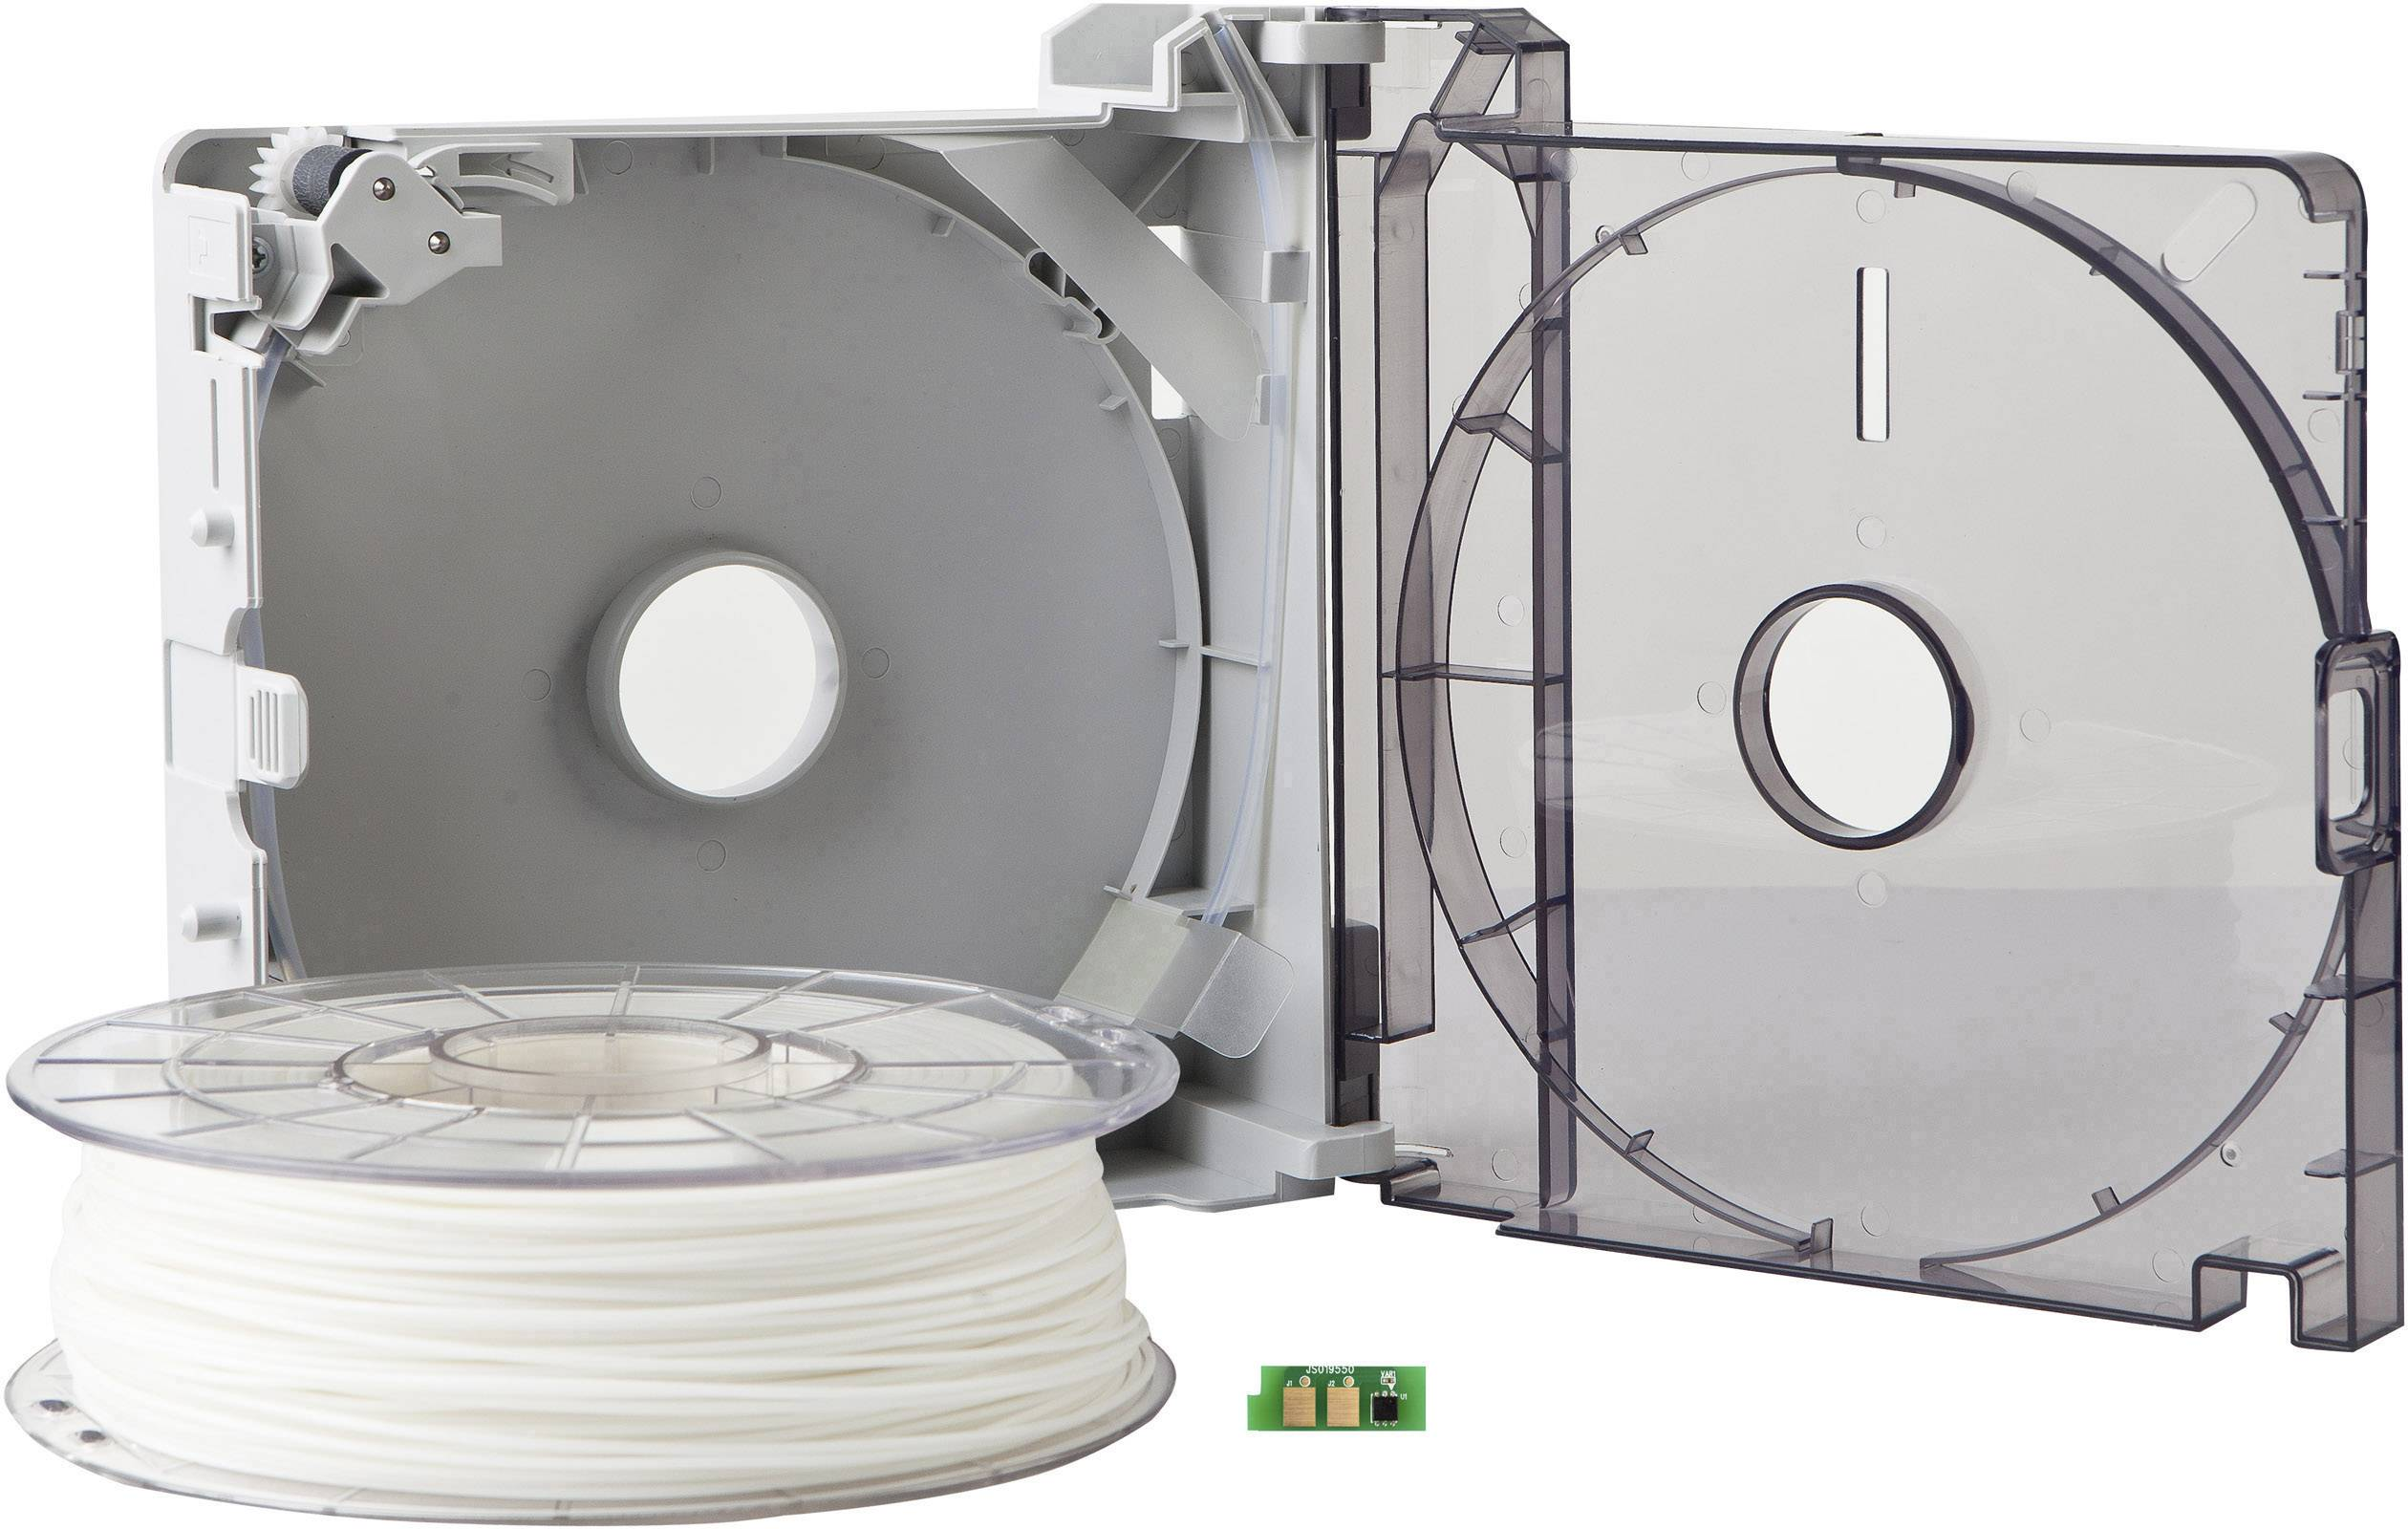 Cartridge s vláknem pro 3D tiskárny Sindoh 3DP200PWH-A, PLA plast, 1.75 mm, 700 g, bílá